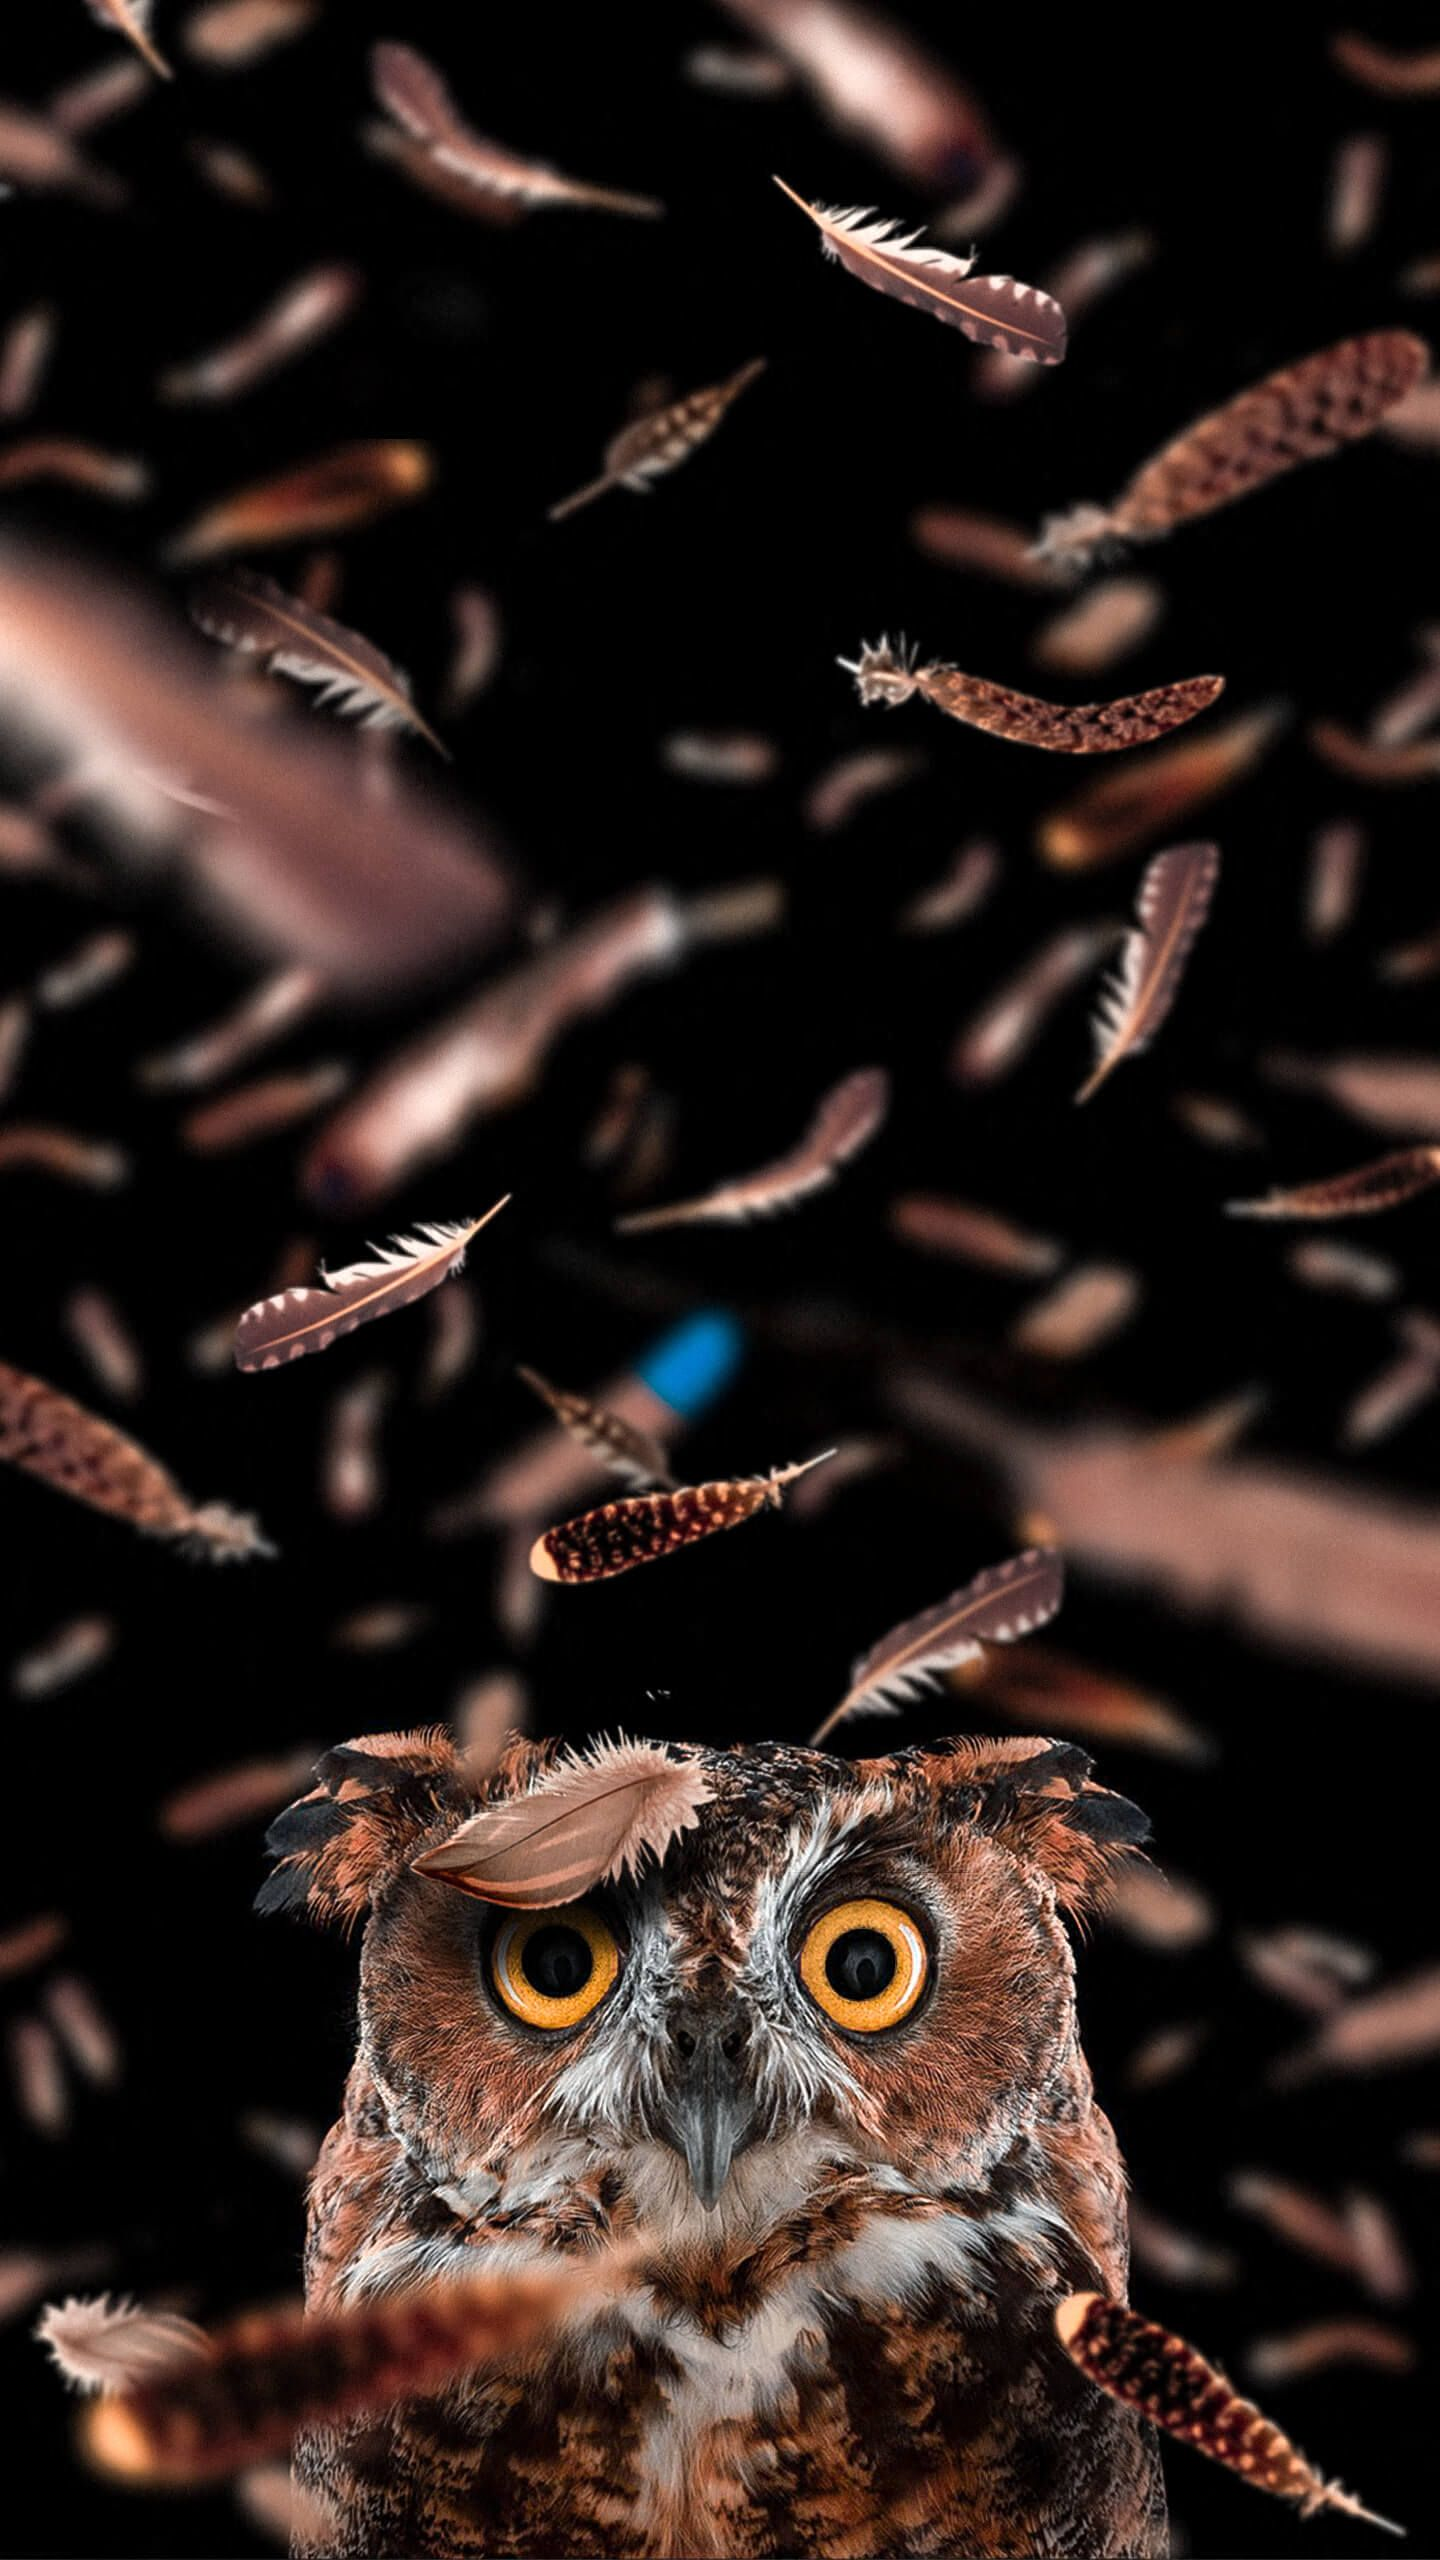 Curious owl (credits to alexandr bally) Owl wallpaper